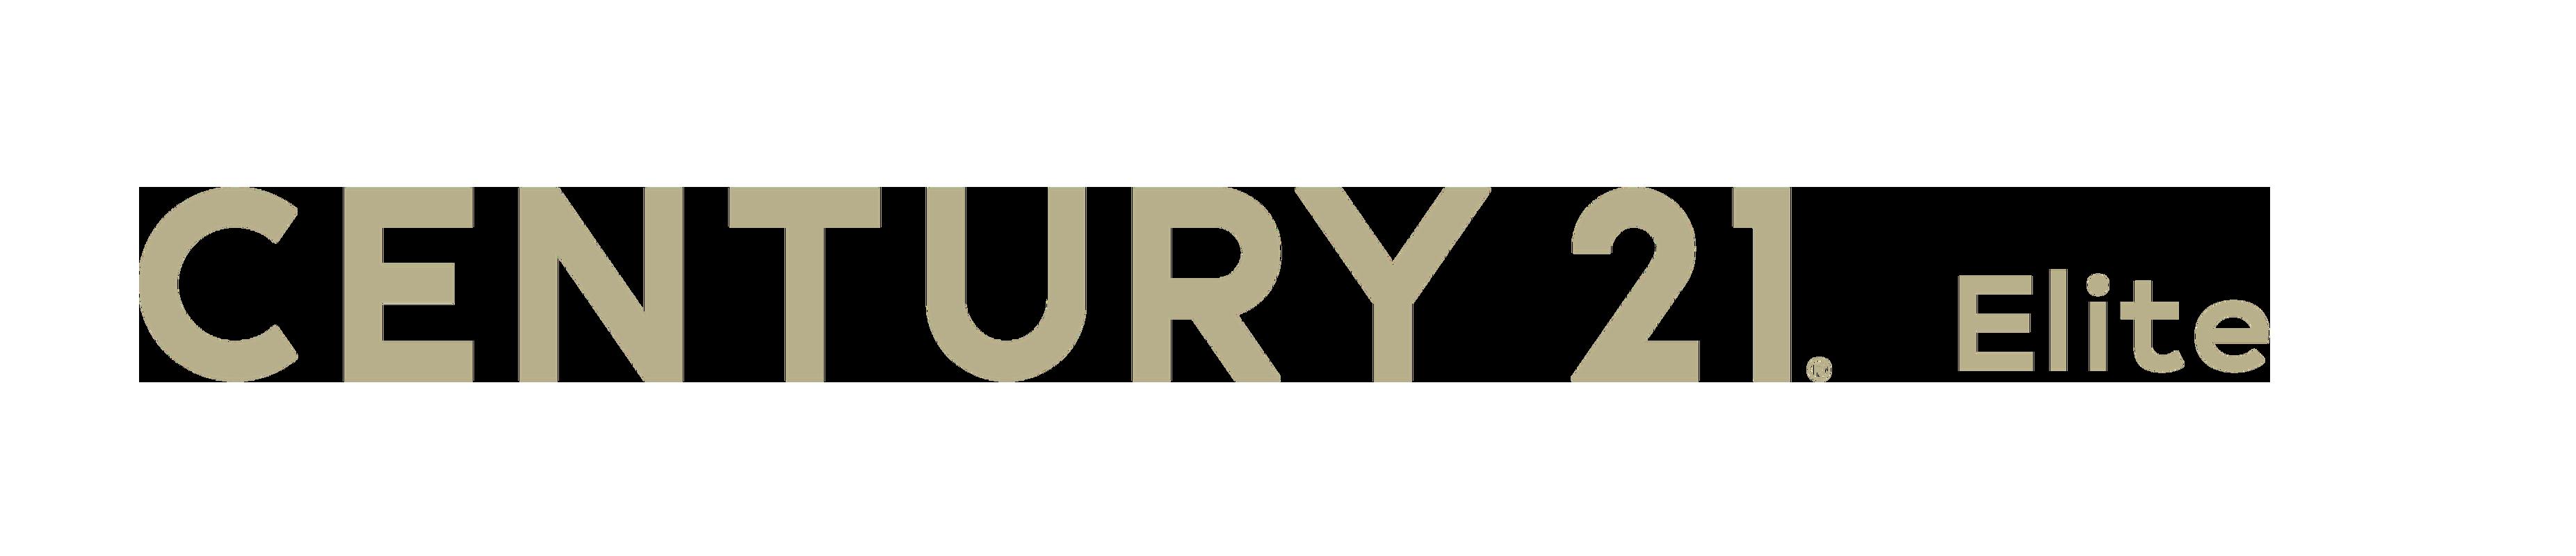 century 21 elite logo